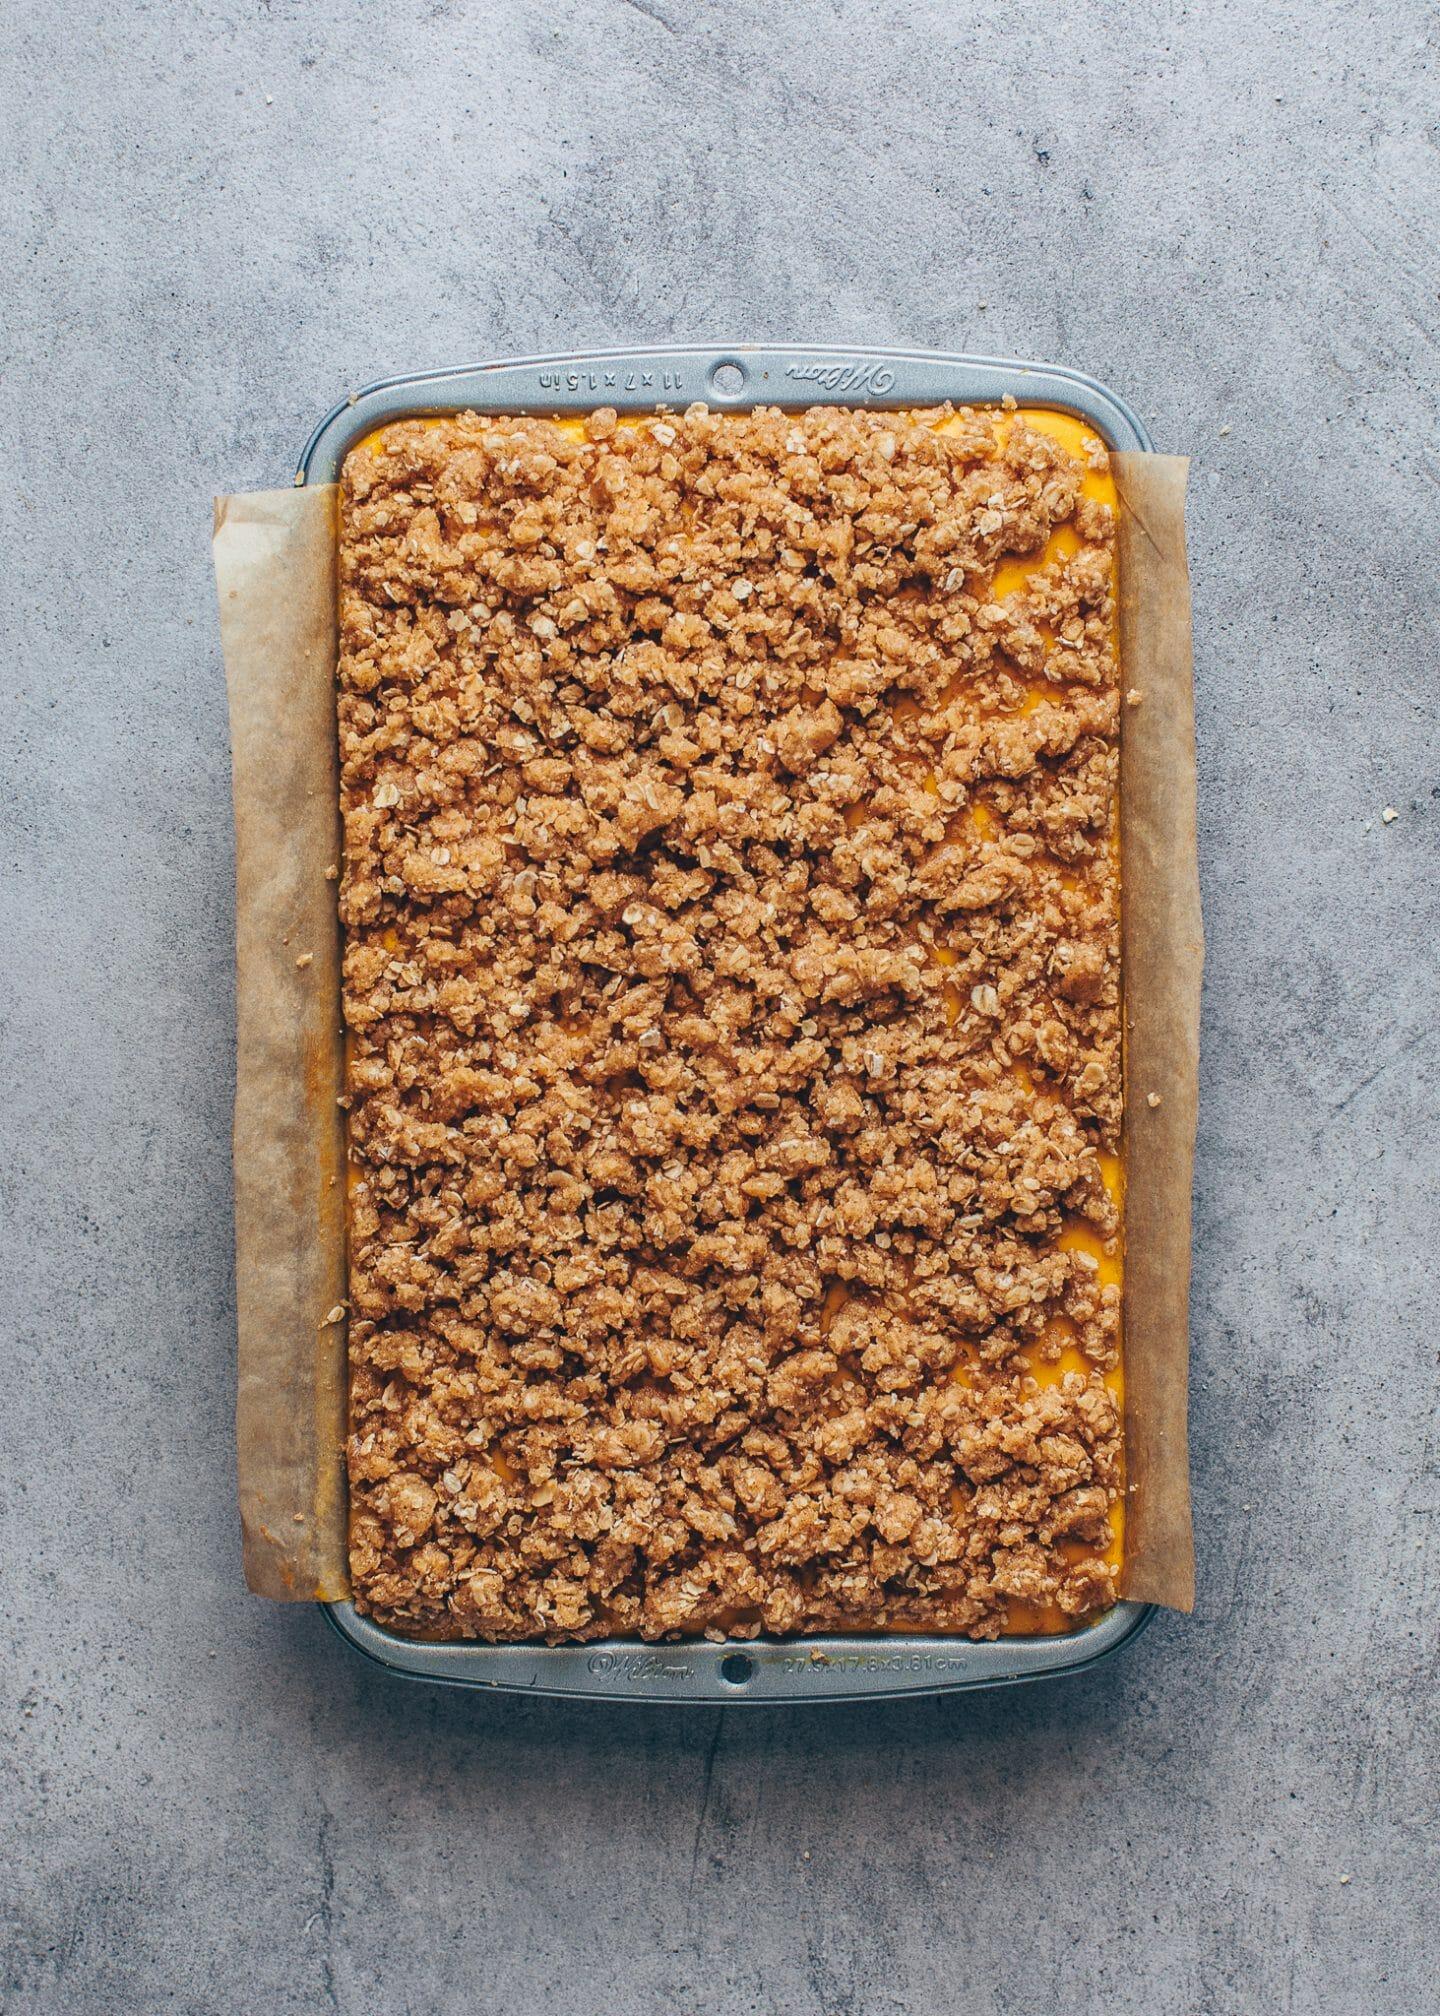 Streusel-Käsekuchen (Kürbis Cheesecake)